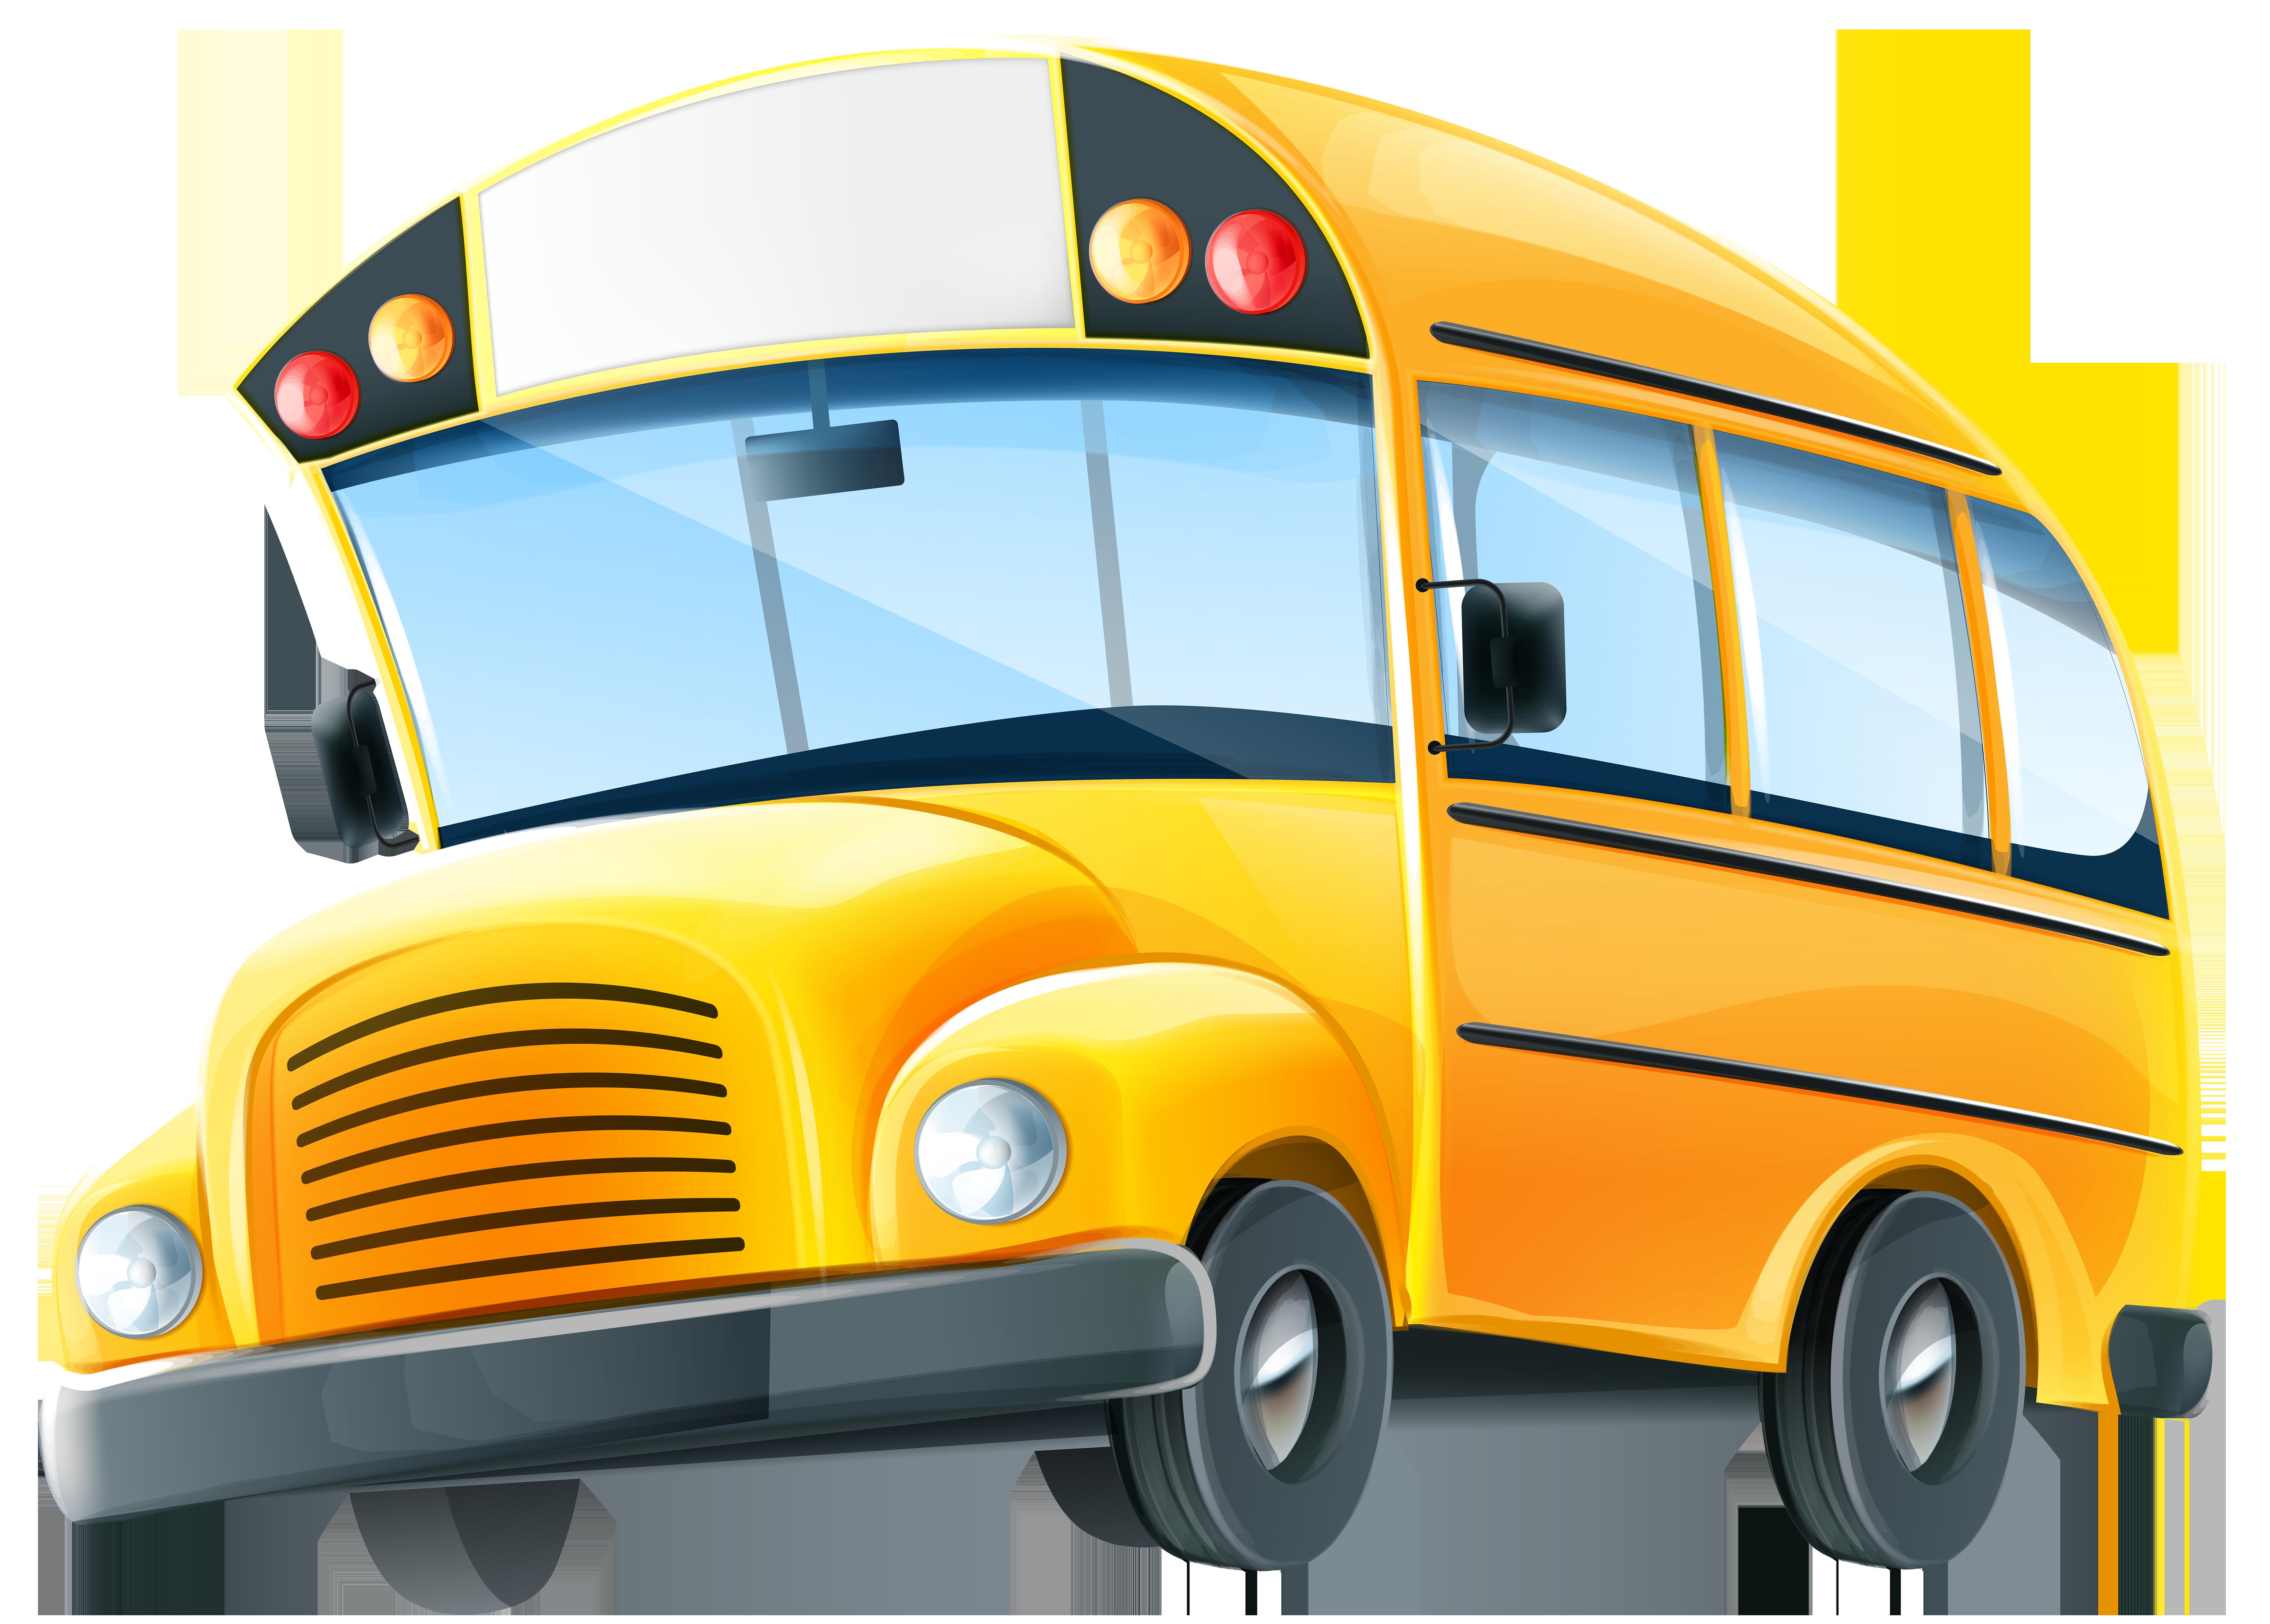 Christmas school bus clipart image freeuse stock School bus Cartoon Clip art - School Bus PNG Clip Art Image 7000 ... image freeuse stock